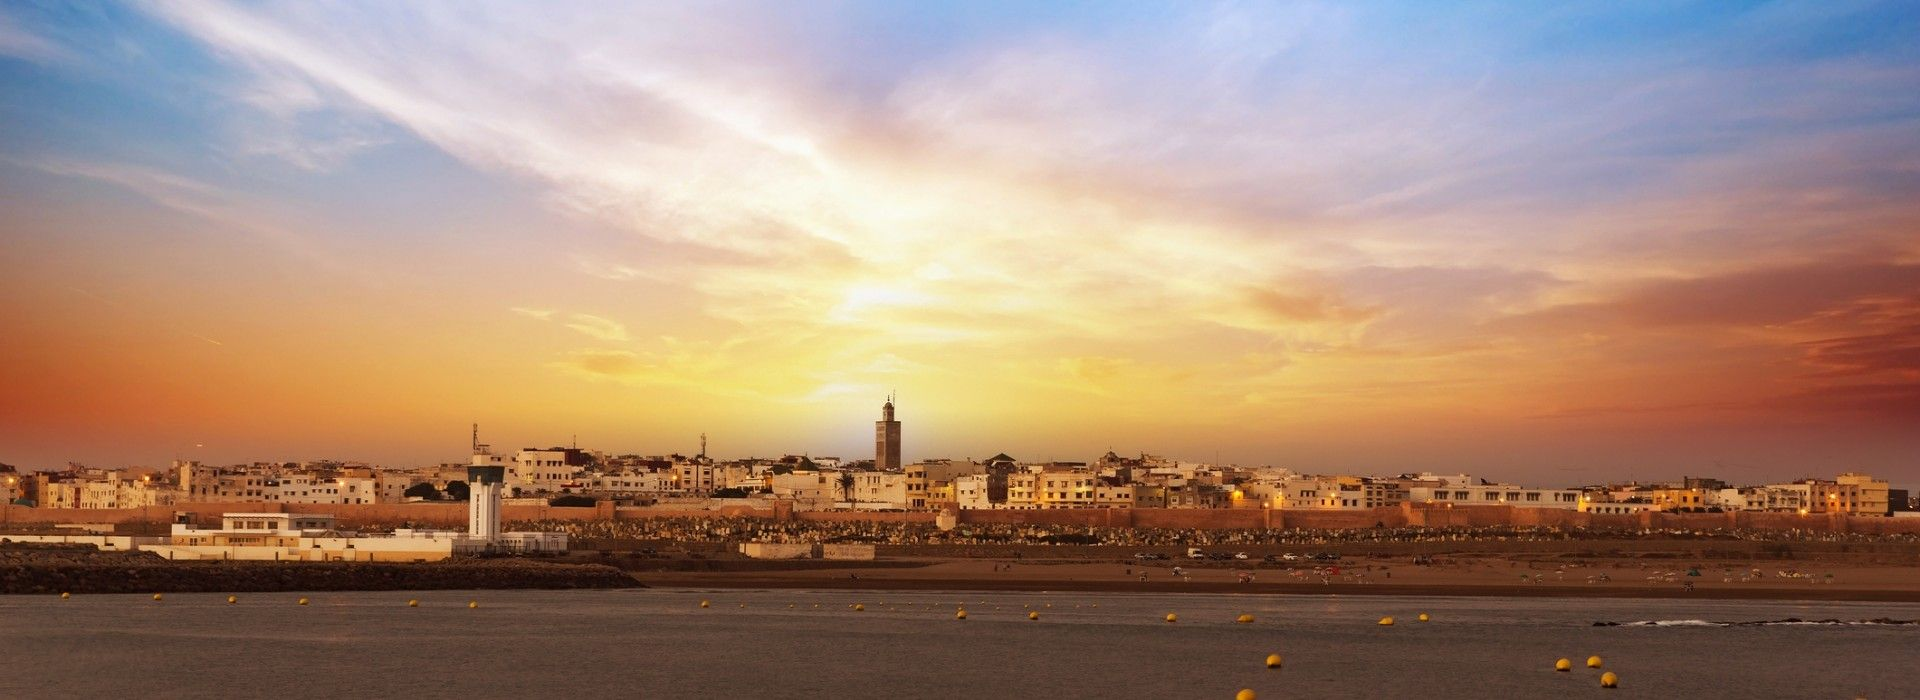 Family Tours in Casablanca